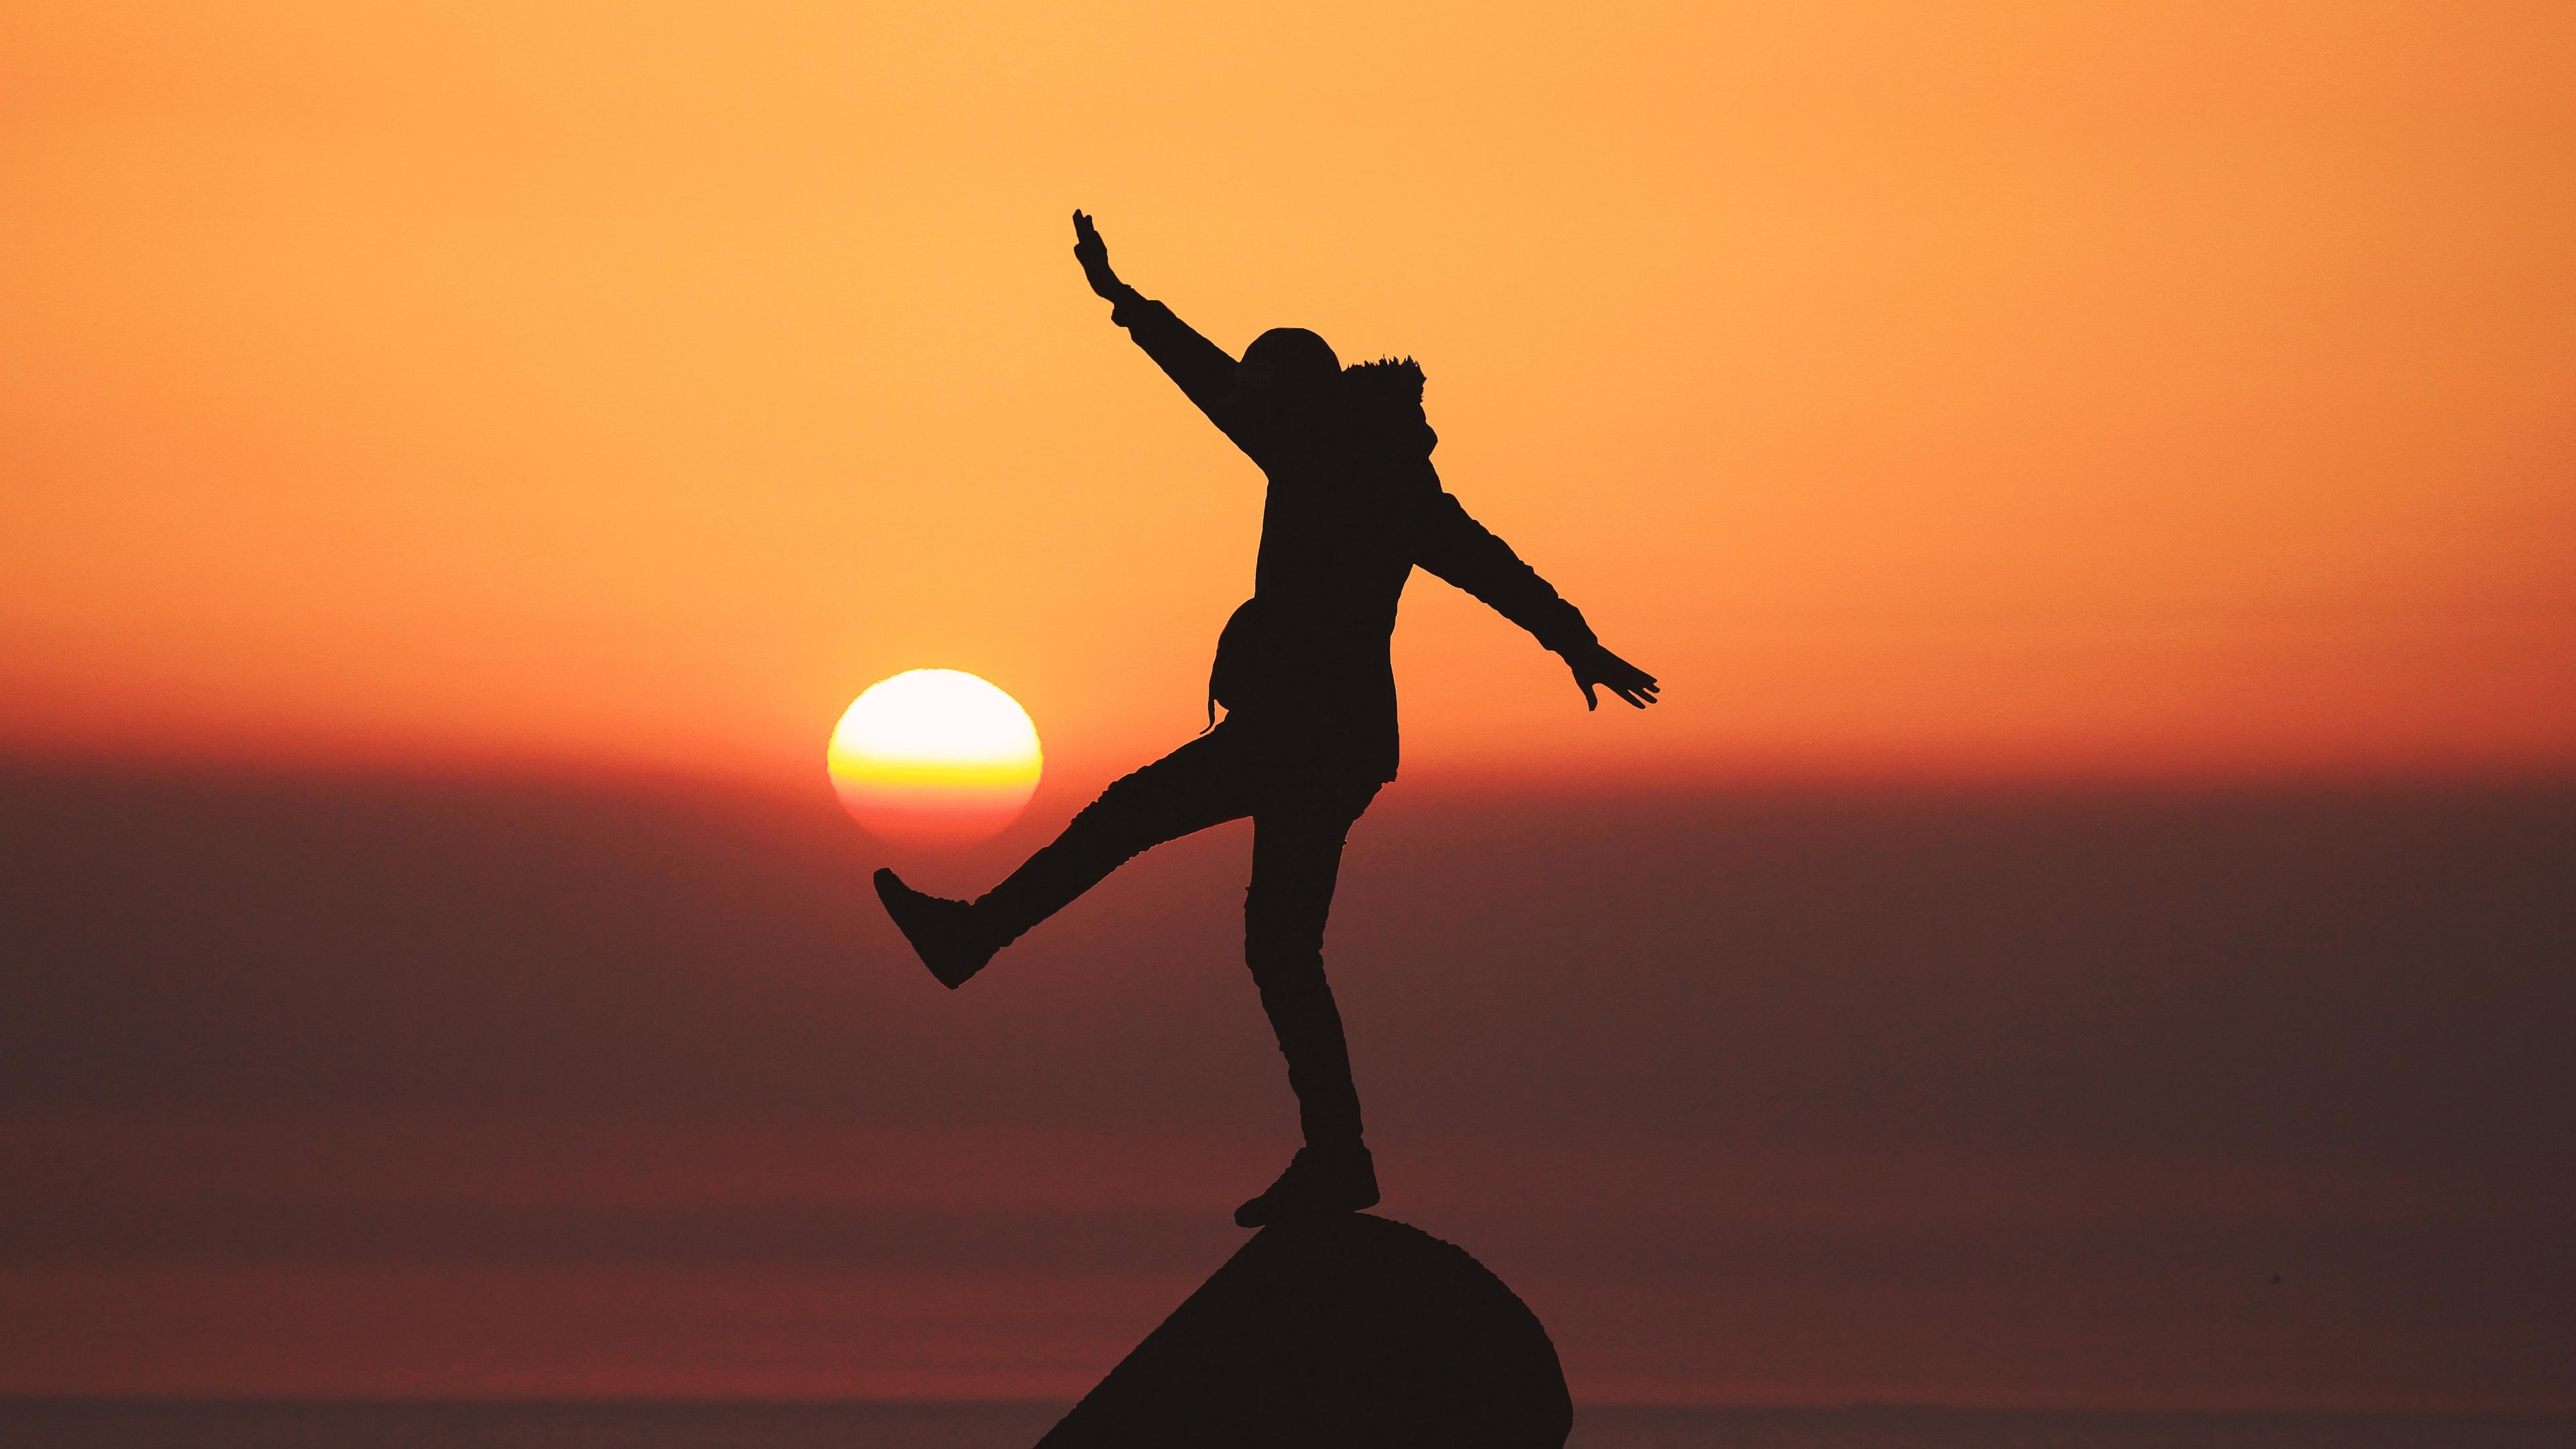 man silhouette sun sunset 4k 1540576440 - man, silhouette, sun, sunset 4k - Sun, Silhouette, Man